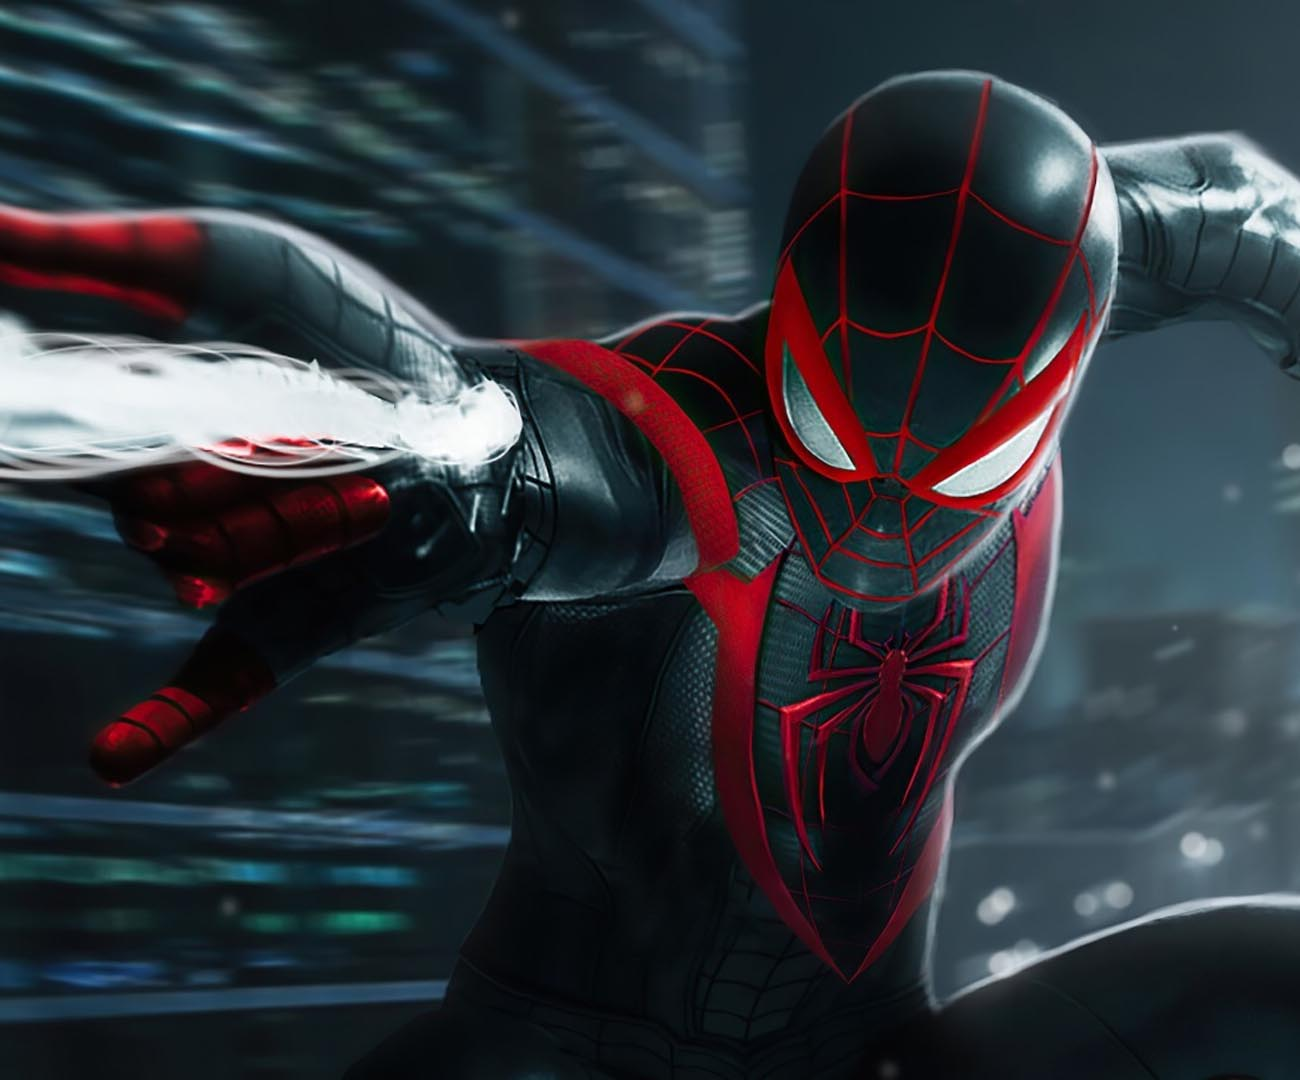 Ładowanie GTA 5 – 5 sekund. Spider-Man Miles Morales – 2 sekundy. Musicie to zobaczyć